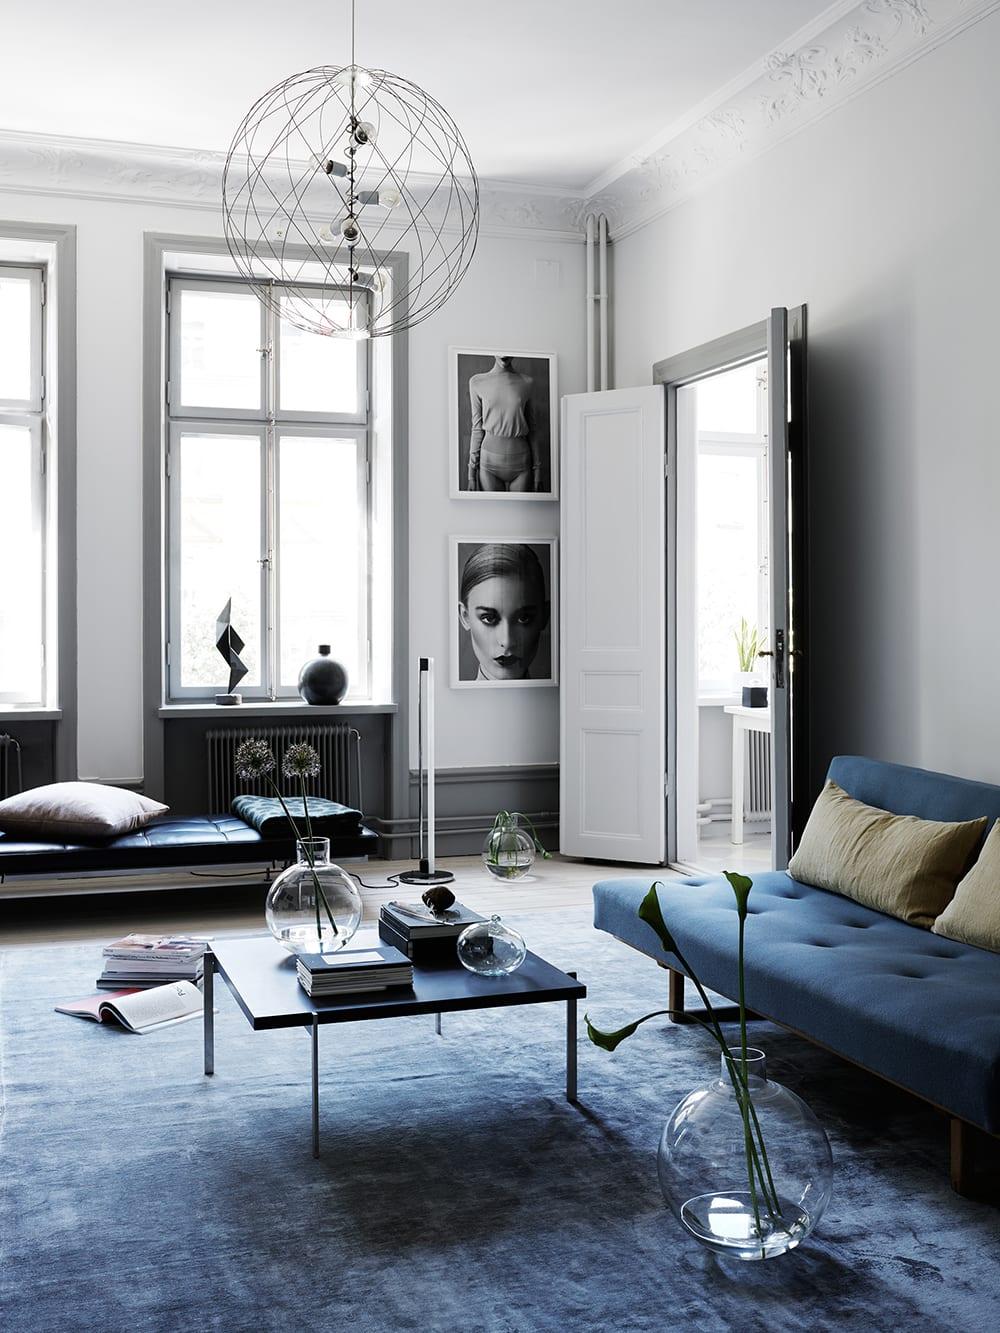 Style&Minimalism | Interiors | Maria Wretblad's Home | Photographer Kristofer Johnsson & Interior Stylist Saša Antić